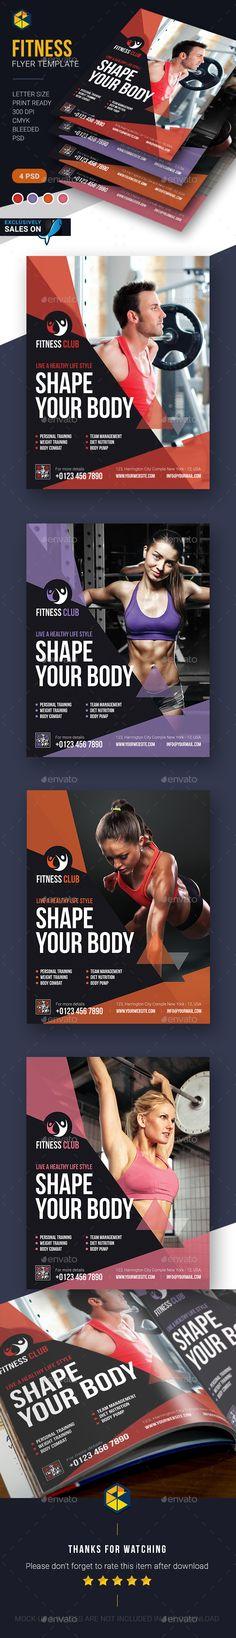 Fitness Flyer Template PSD #design Download: http://graphicriver.net/item/fitness-flyer-template/14327228?ref=ksioks